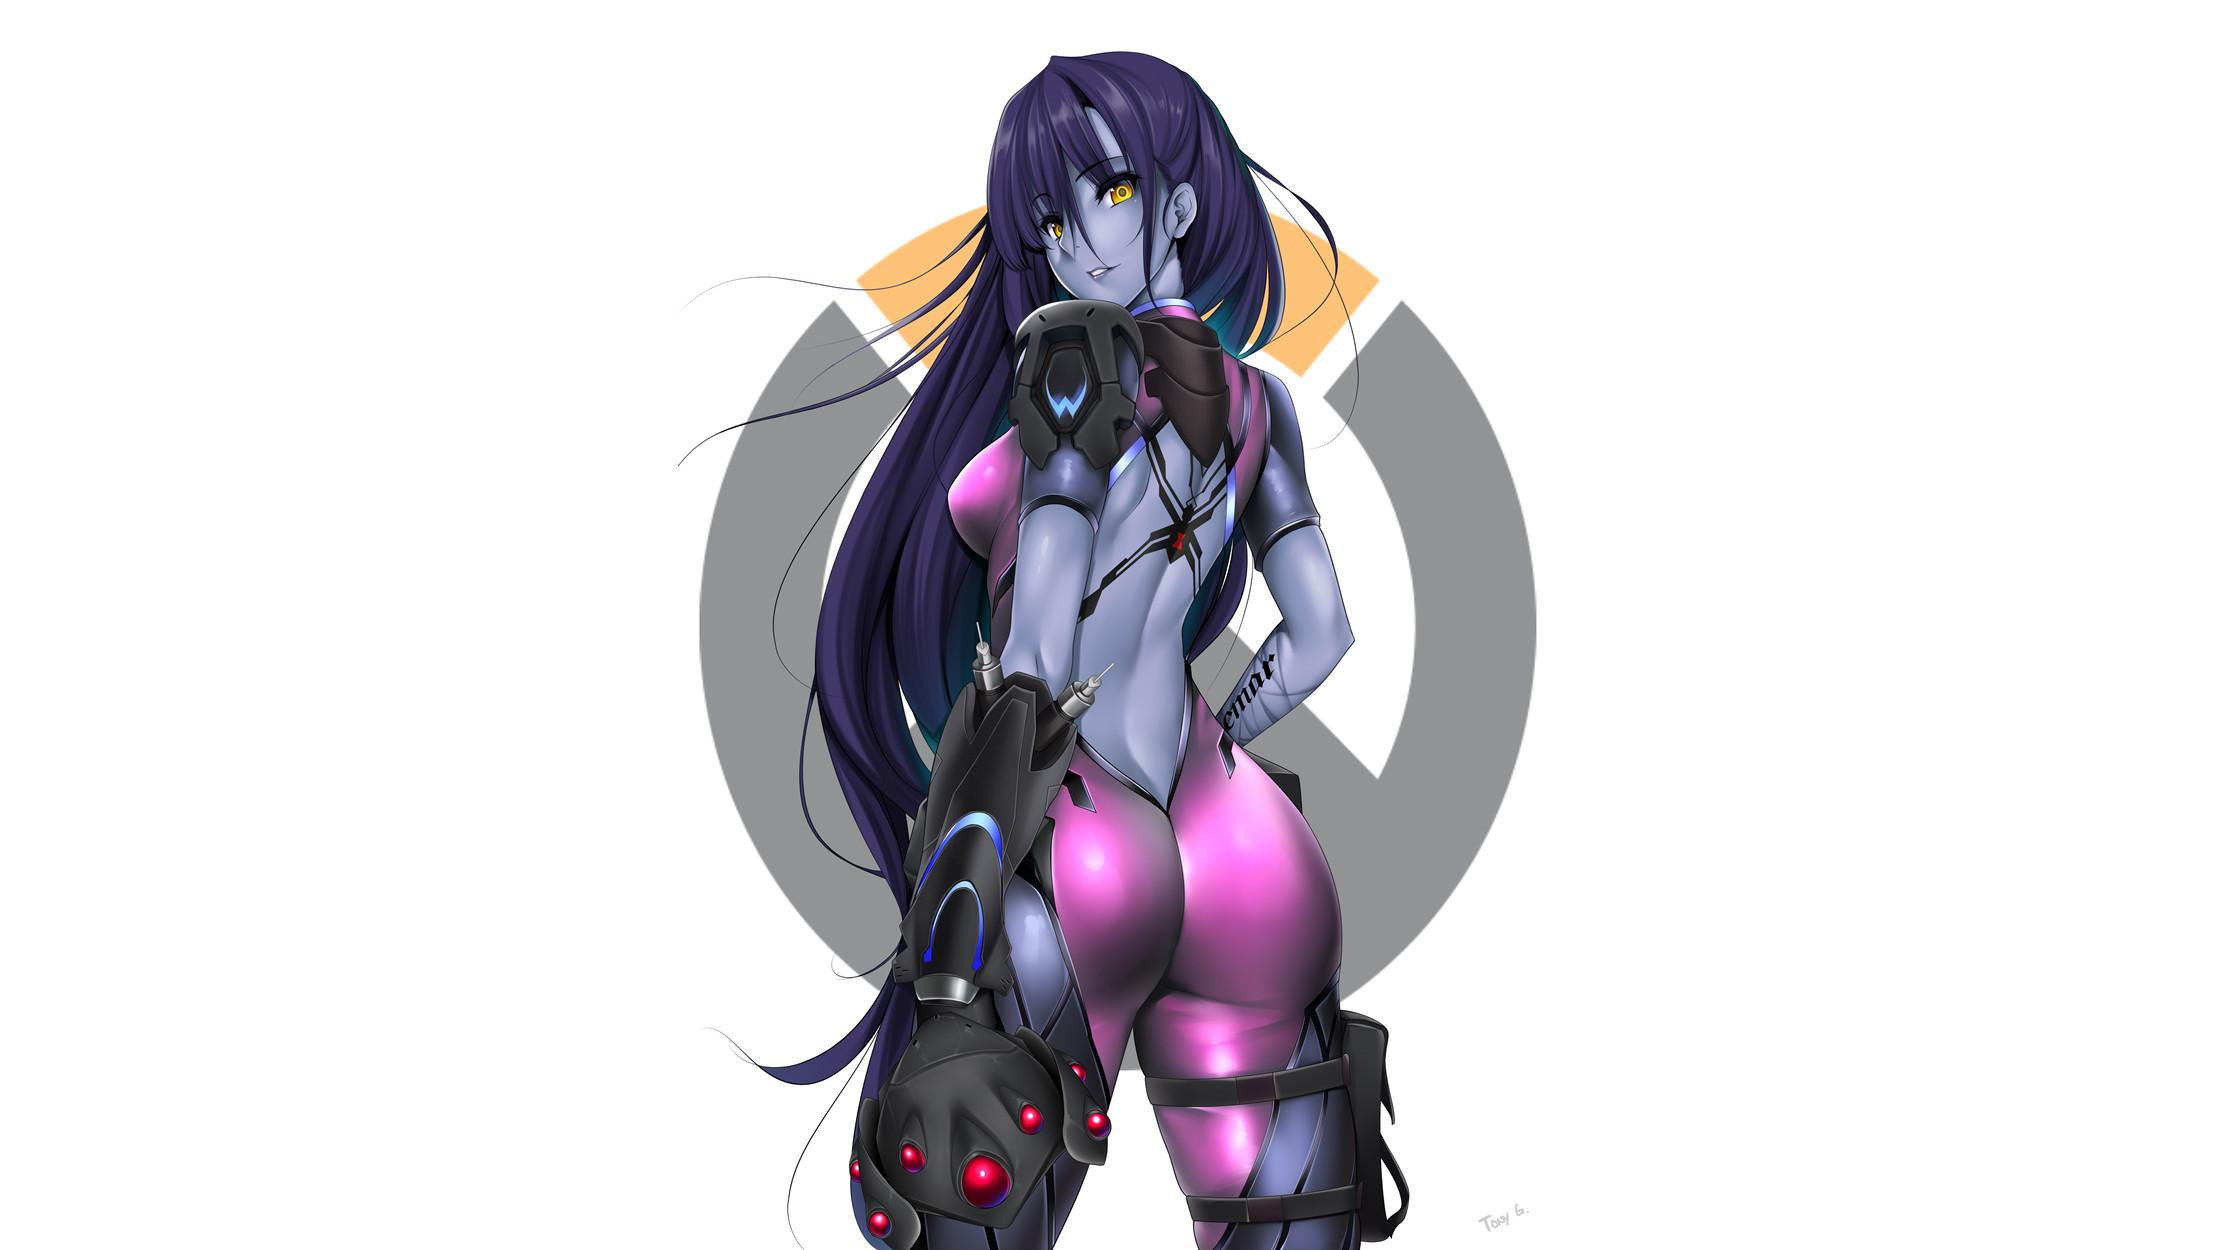 Video Game – Overwatch Widowmaker (Overwatch) Long Hair Purple Hair Yellow  Eyes Wallpaper